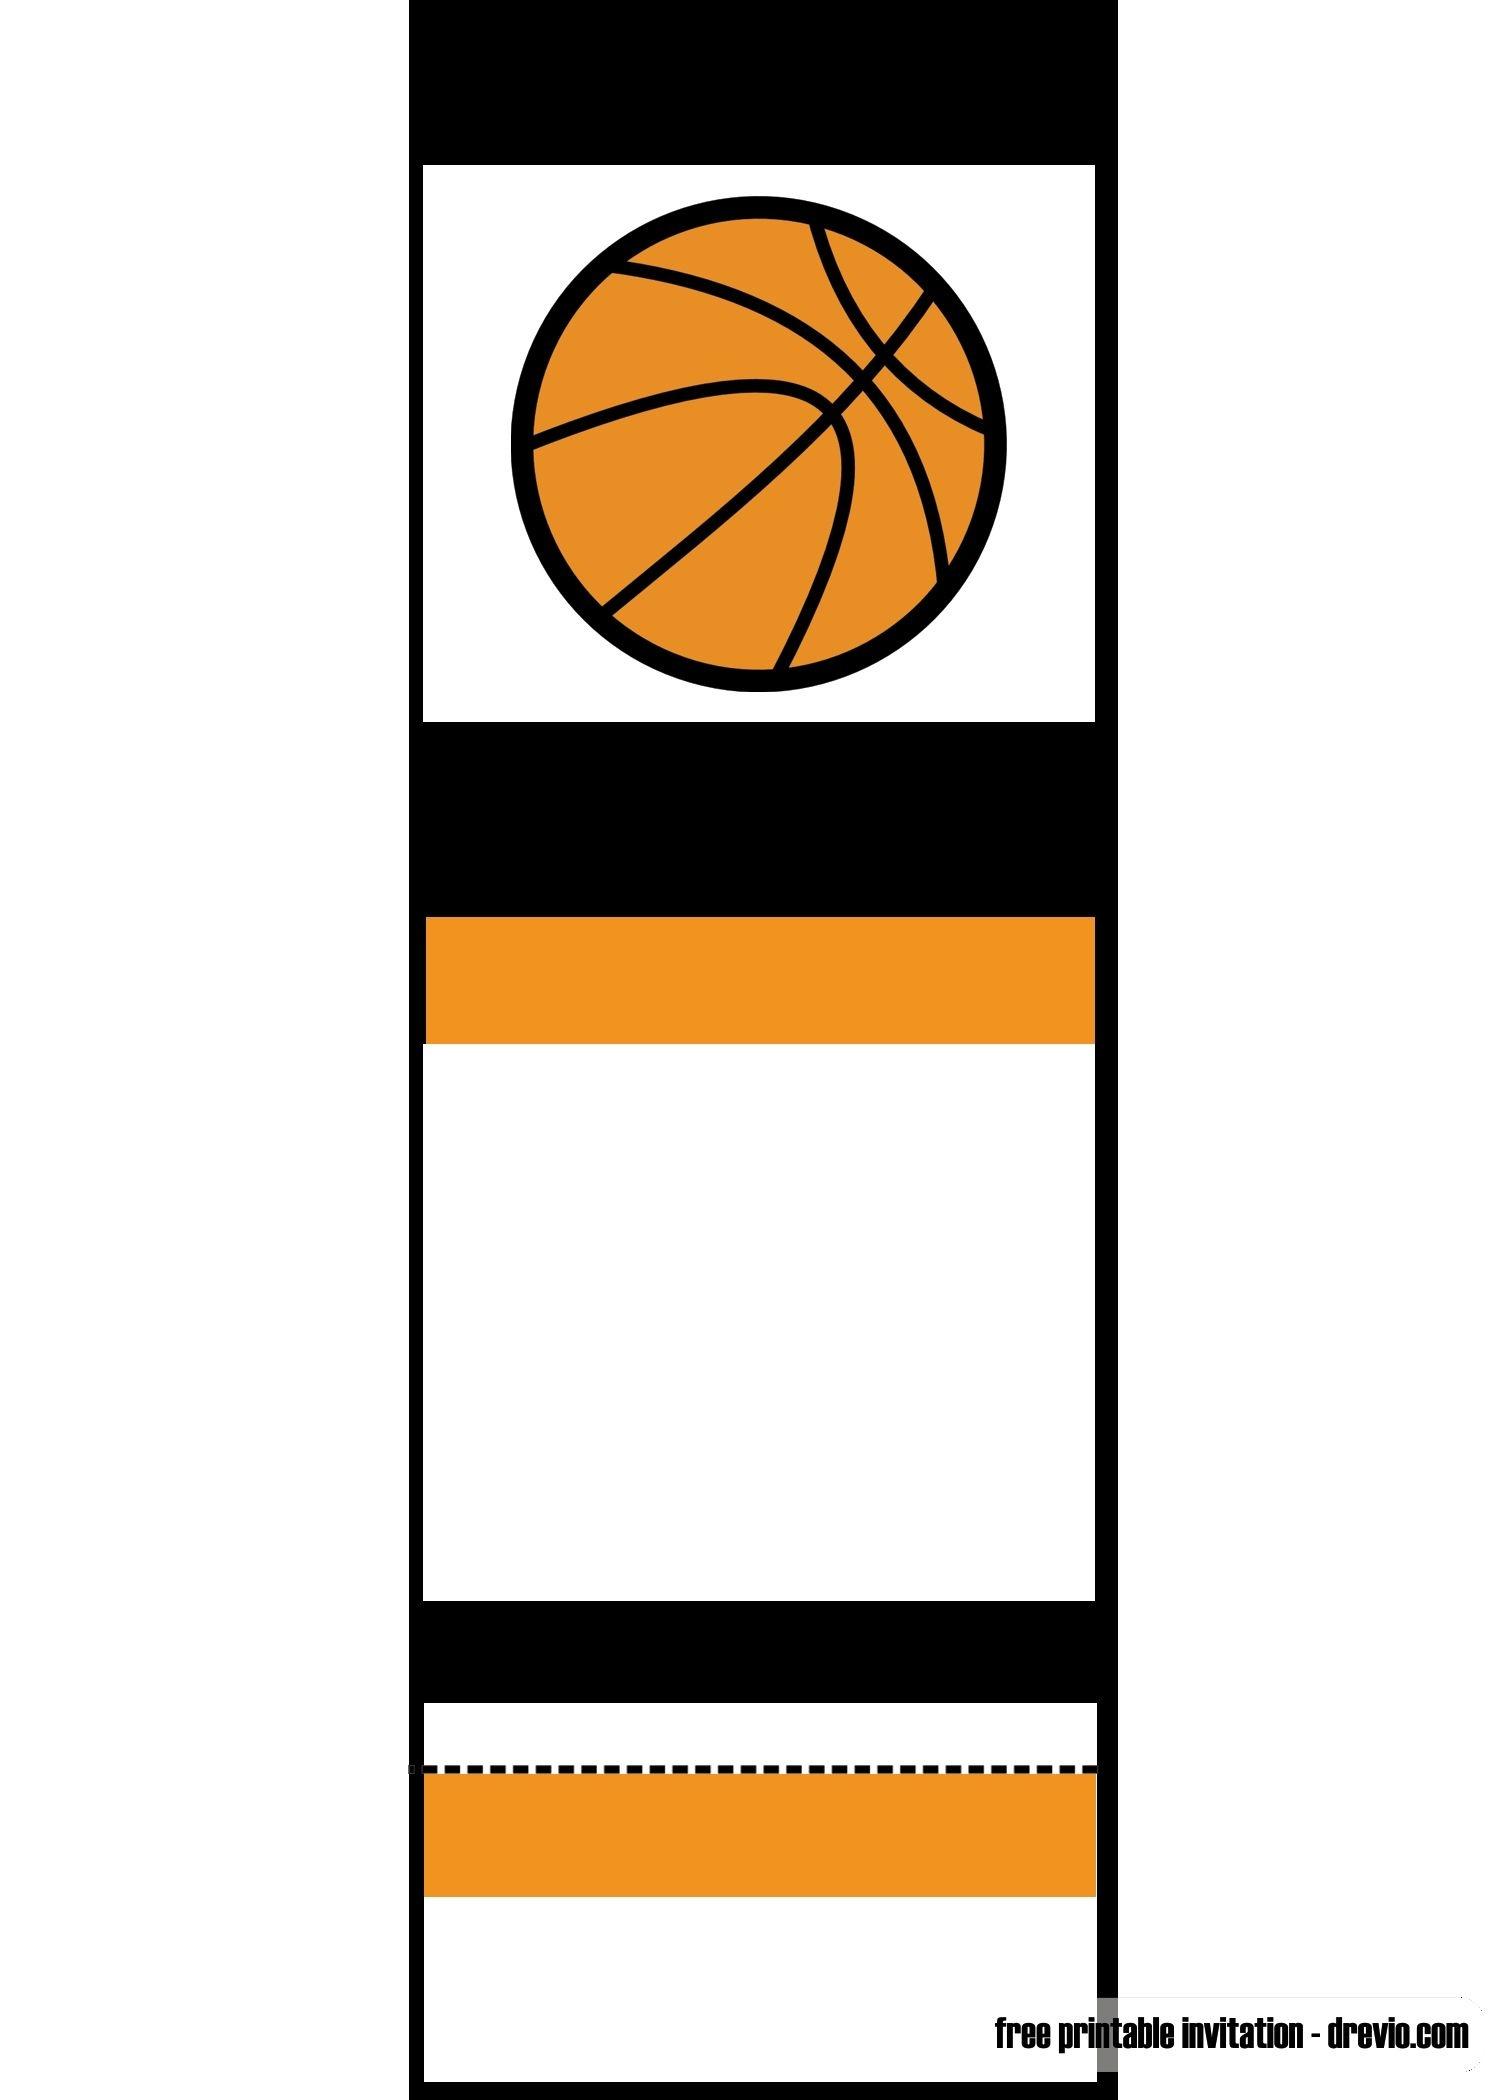 Free Printable Basketball Ticket Invitation   Unc Vs Gonzaga - Free Printable Ticket Invitation Templates